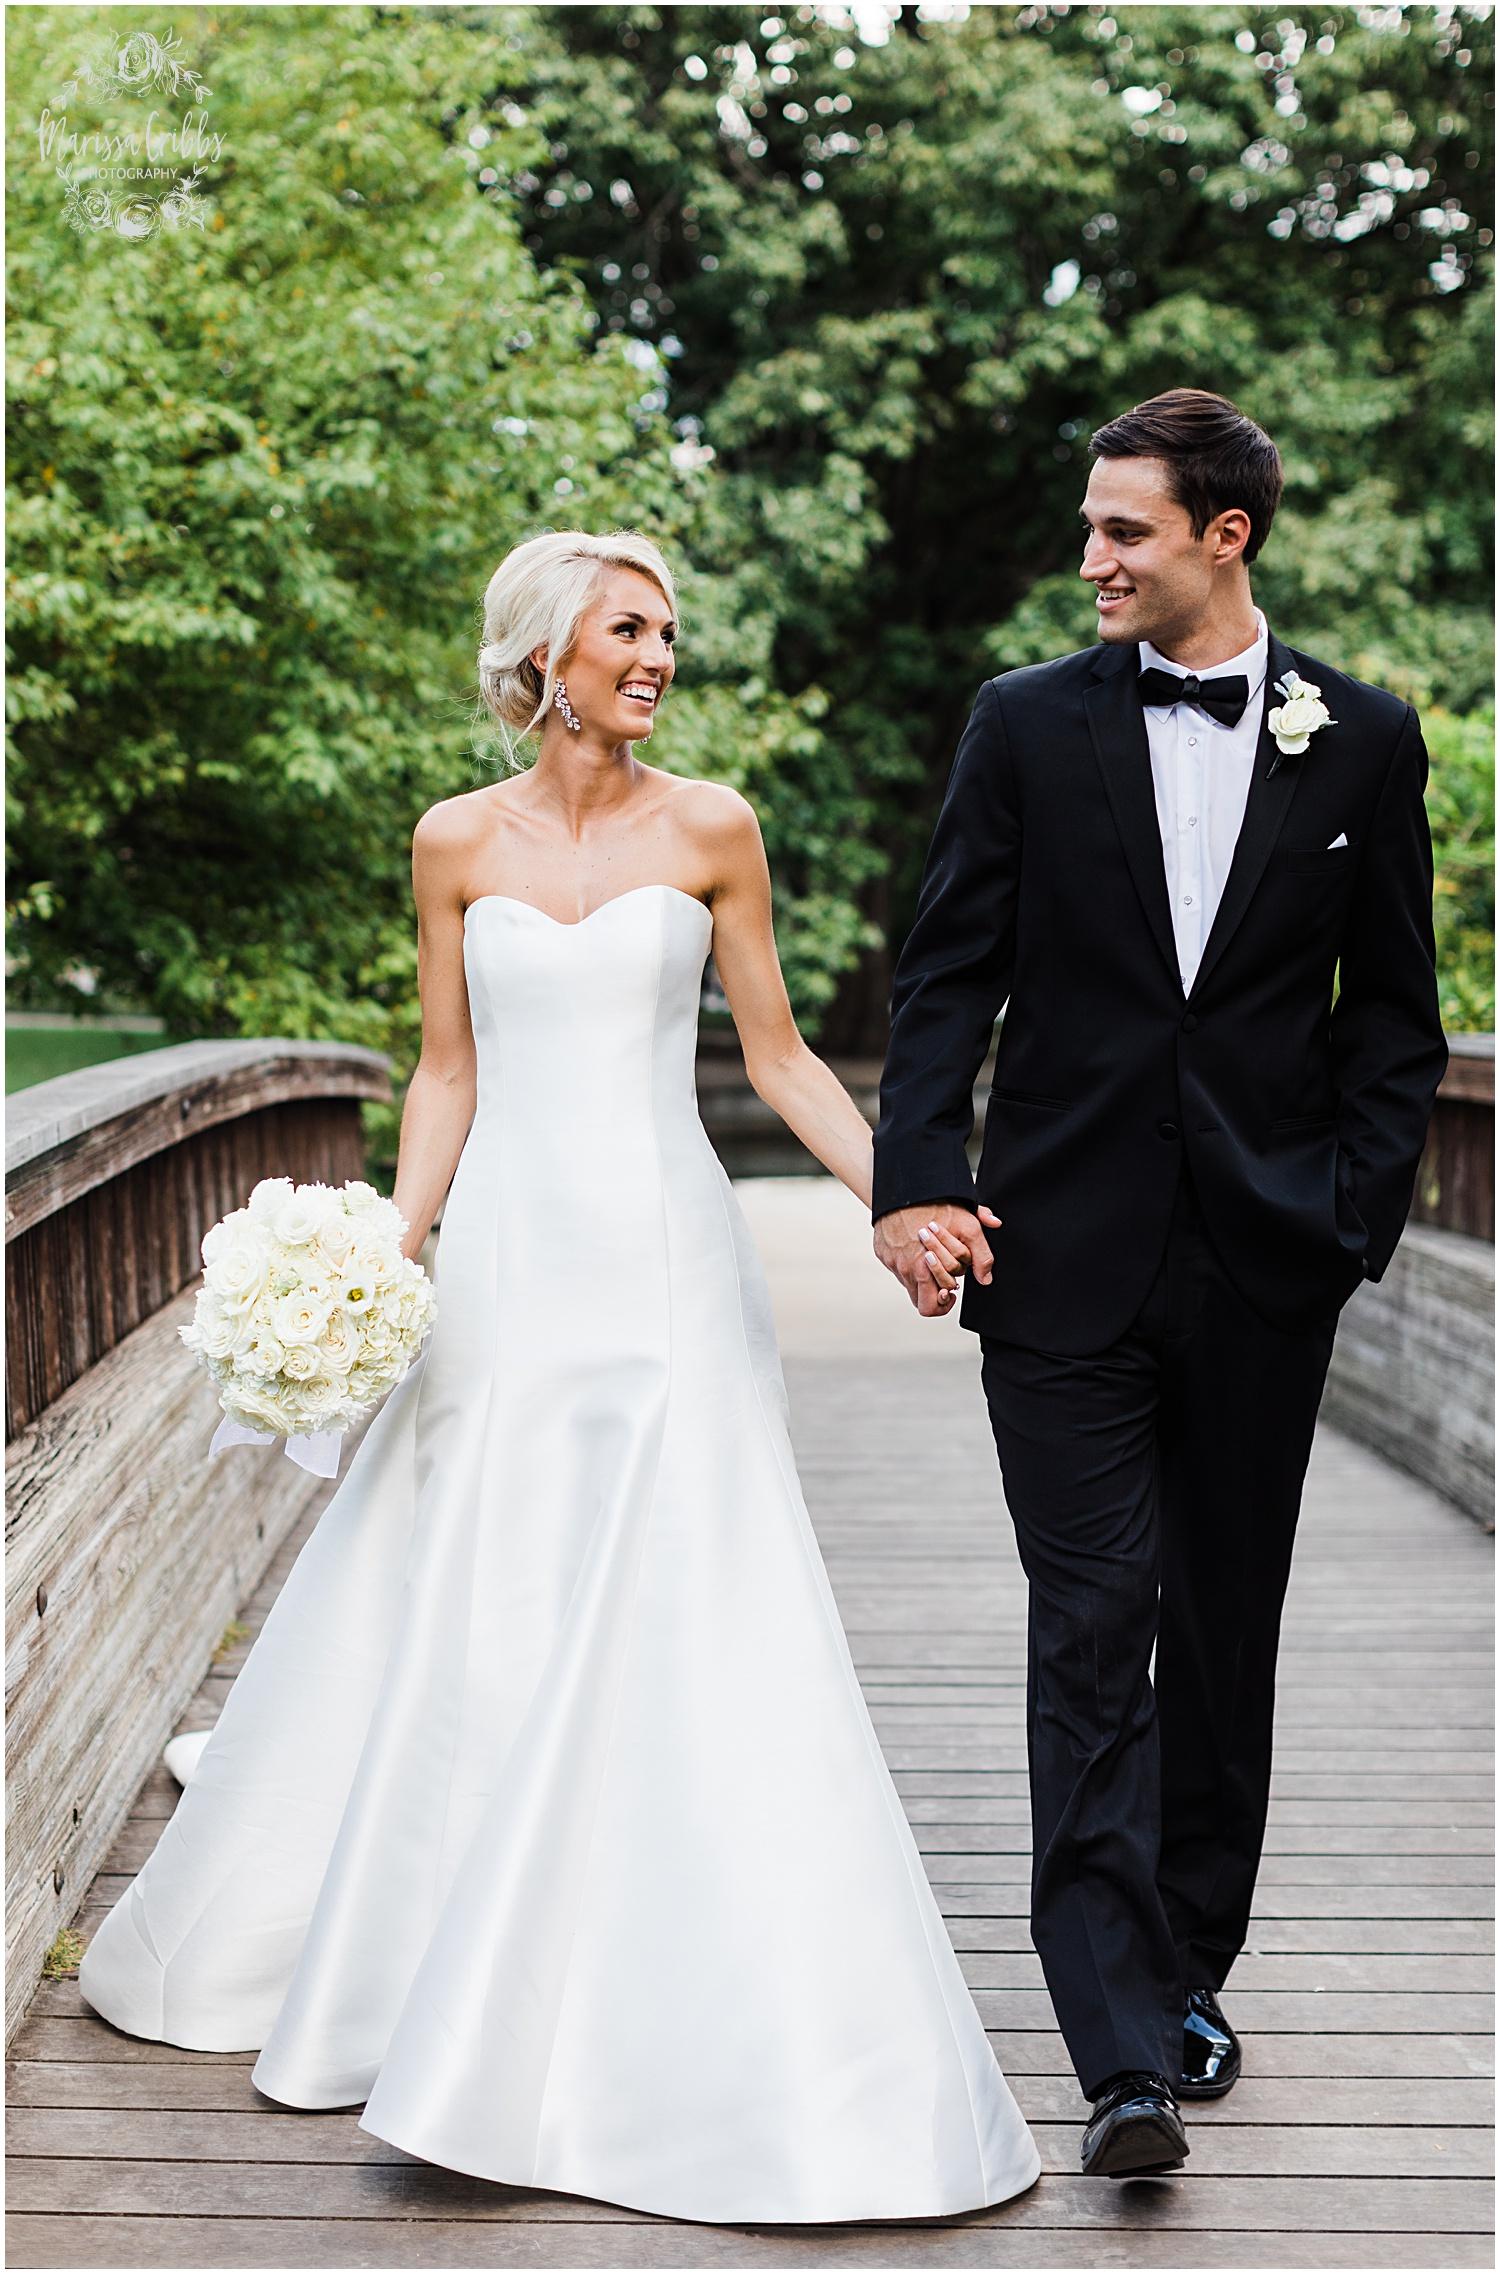 NOLL WEDDING | THE BRASS ON BALTIMORE | MARISSA CRIBBS PHOTOGRAPHY_6312.jpg